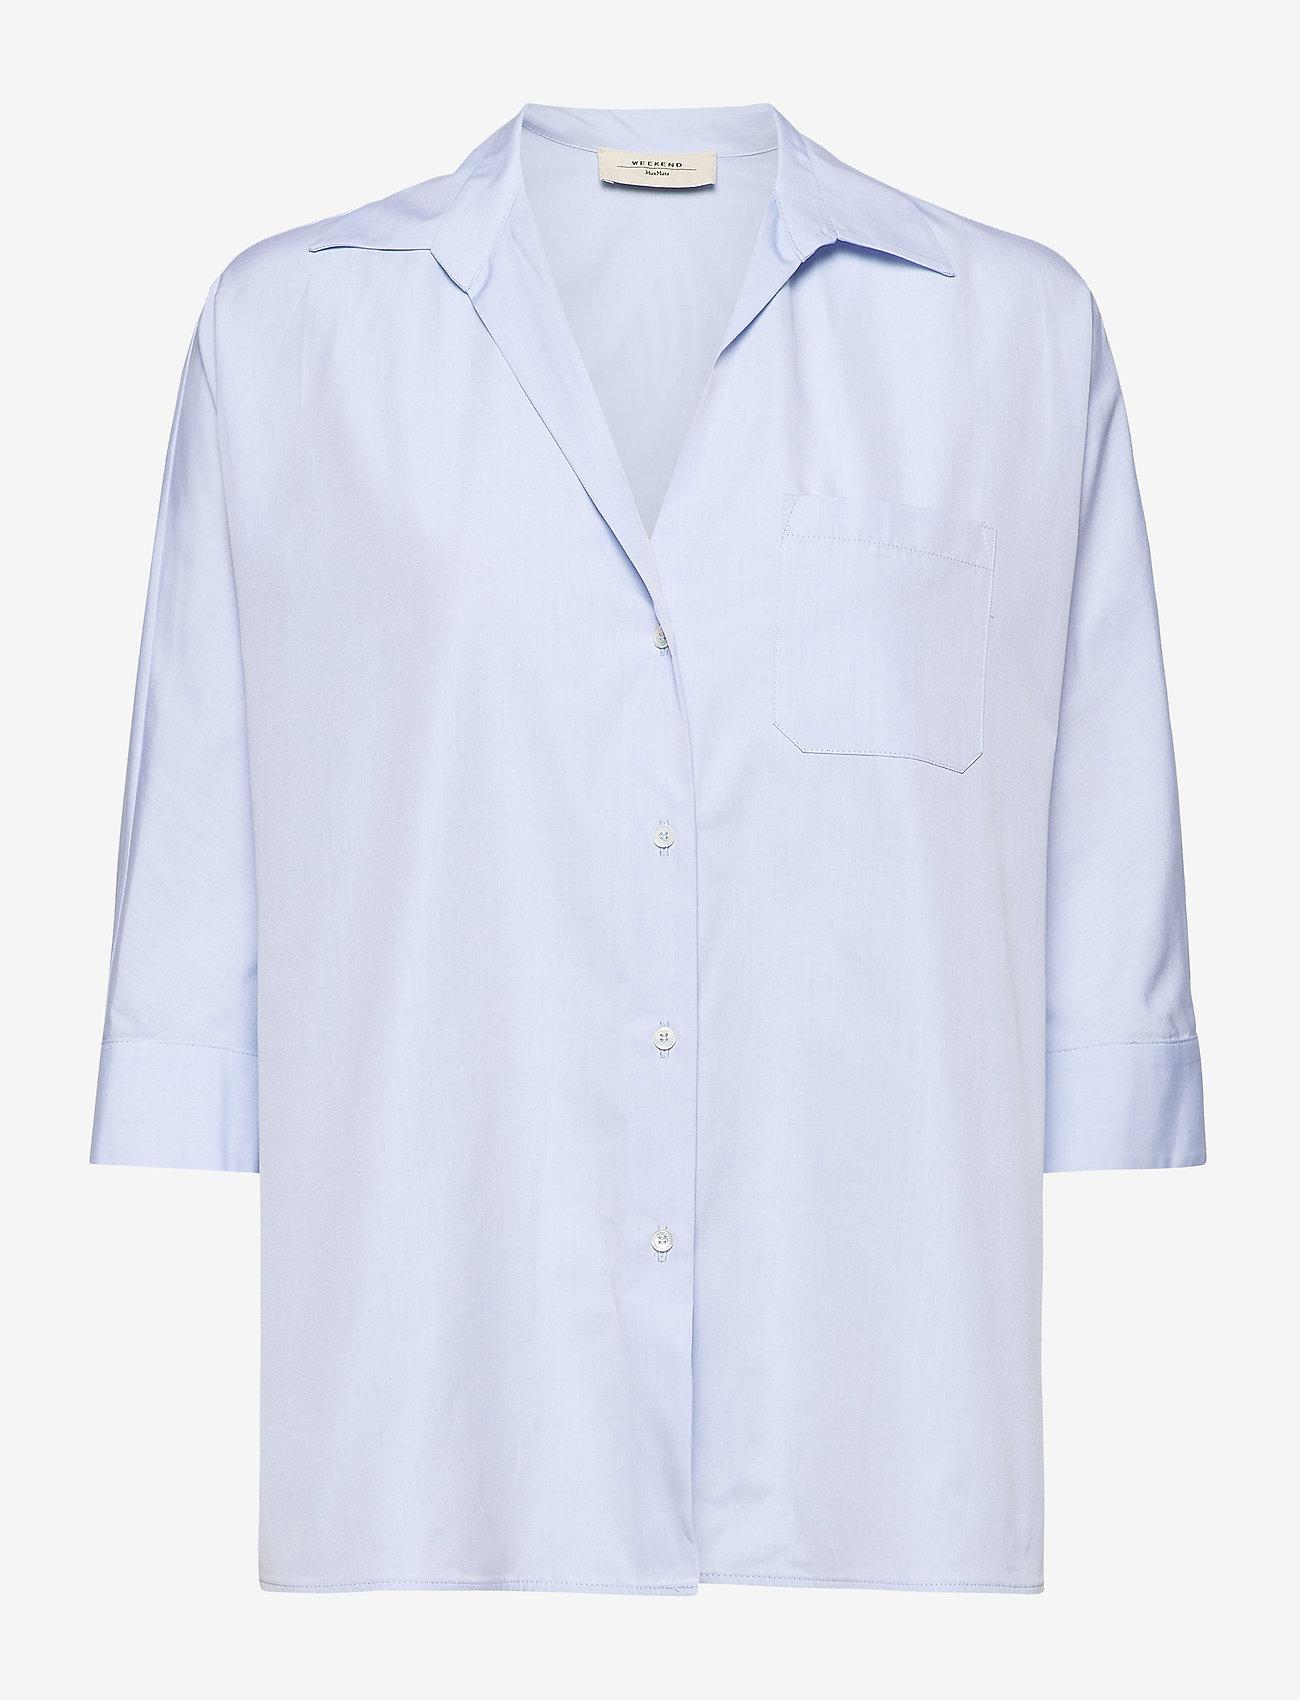 Weekend Max Mara - ERSILIA - chemises à manches longues - light blue - 0